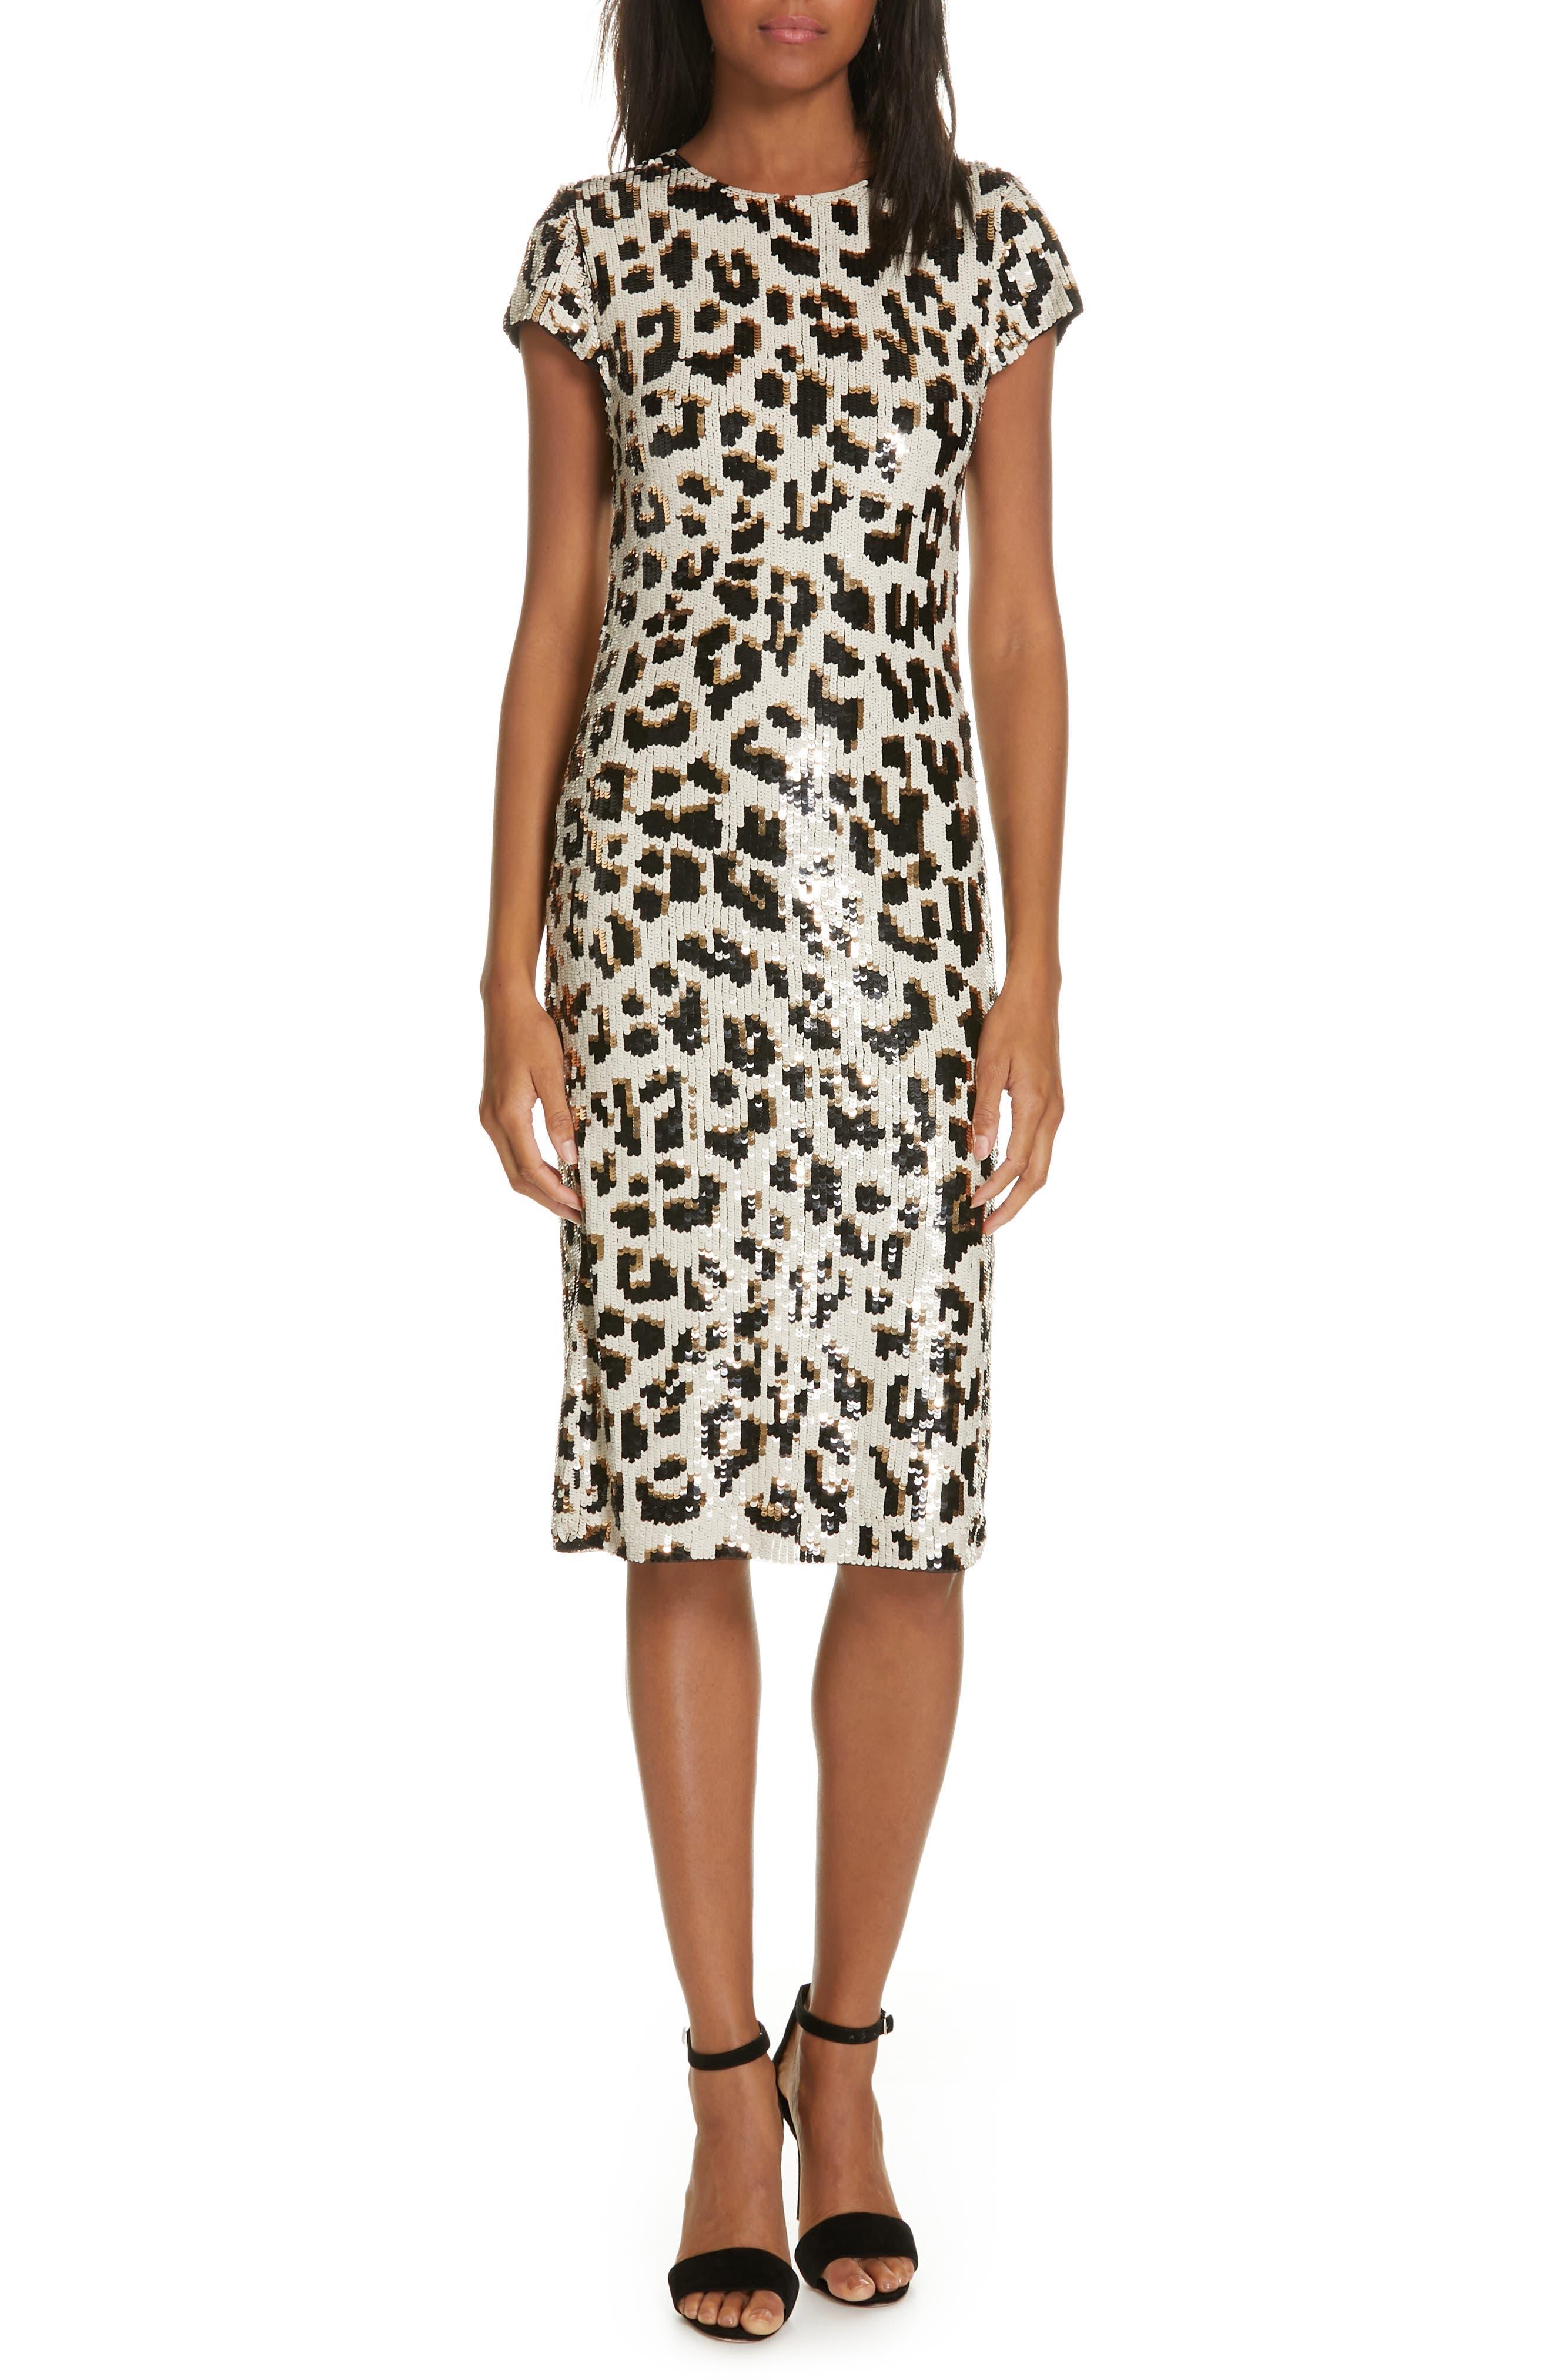 ALICE + OLIVIA Nat Sequin Sheath Dress, Main, color, LEOPARD